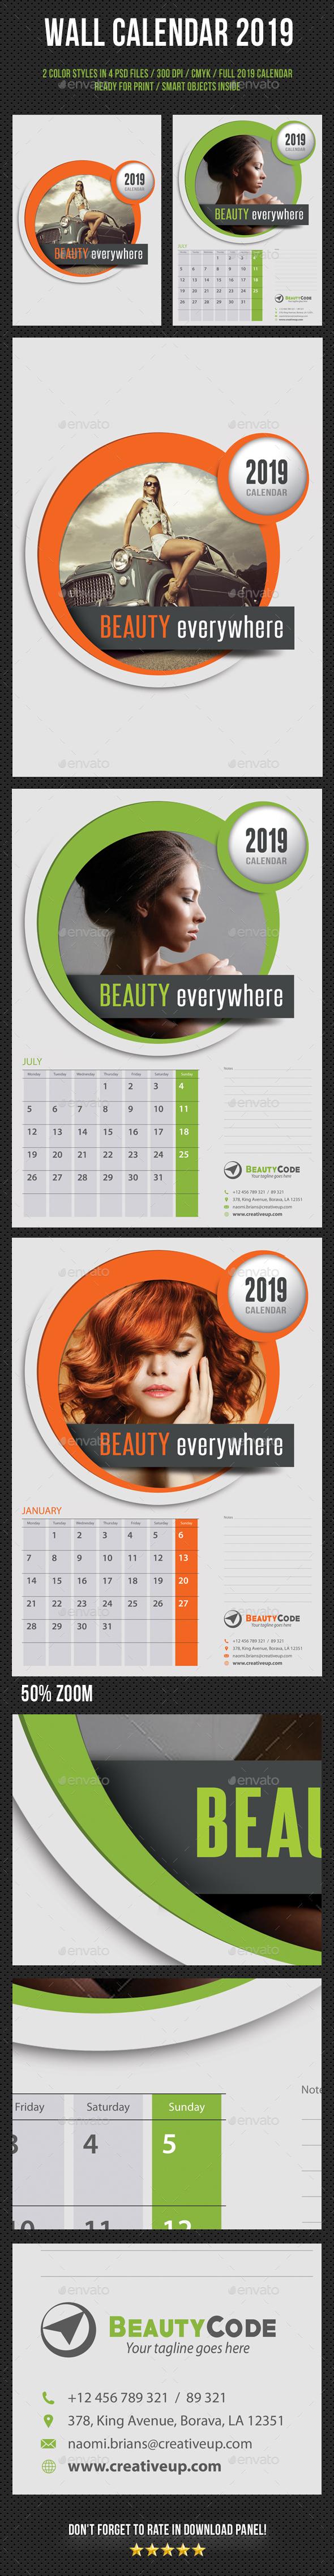 Wall Calendar 2019 V05 - Calendars Stationery